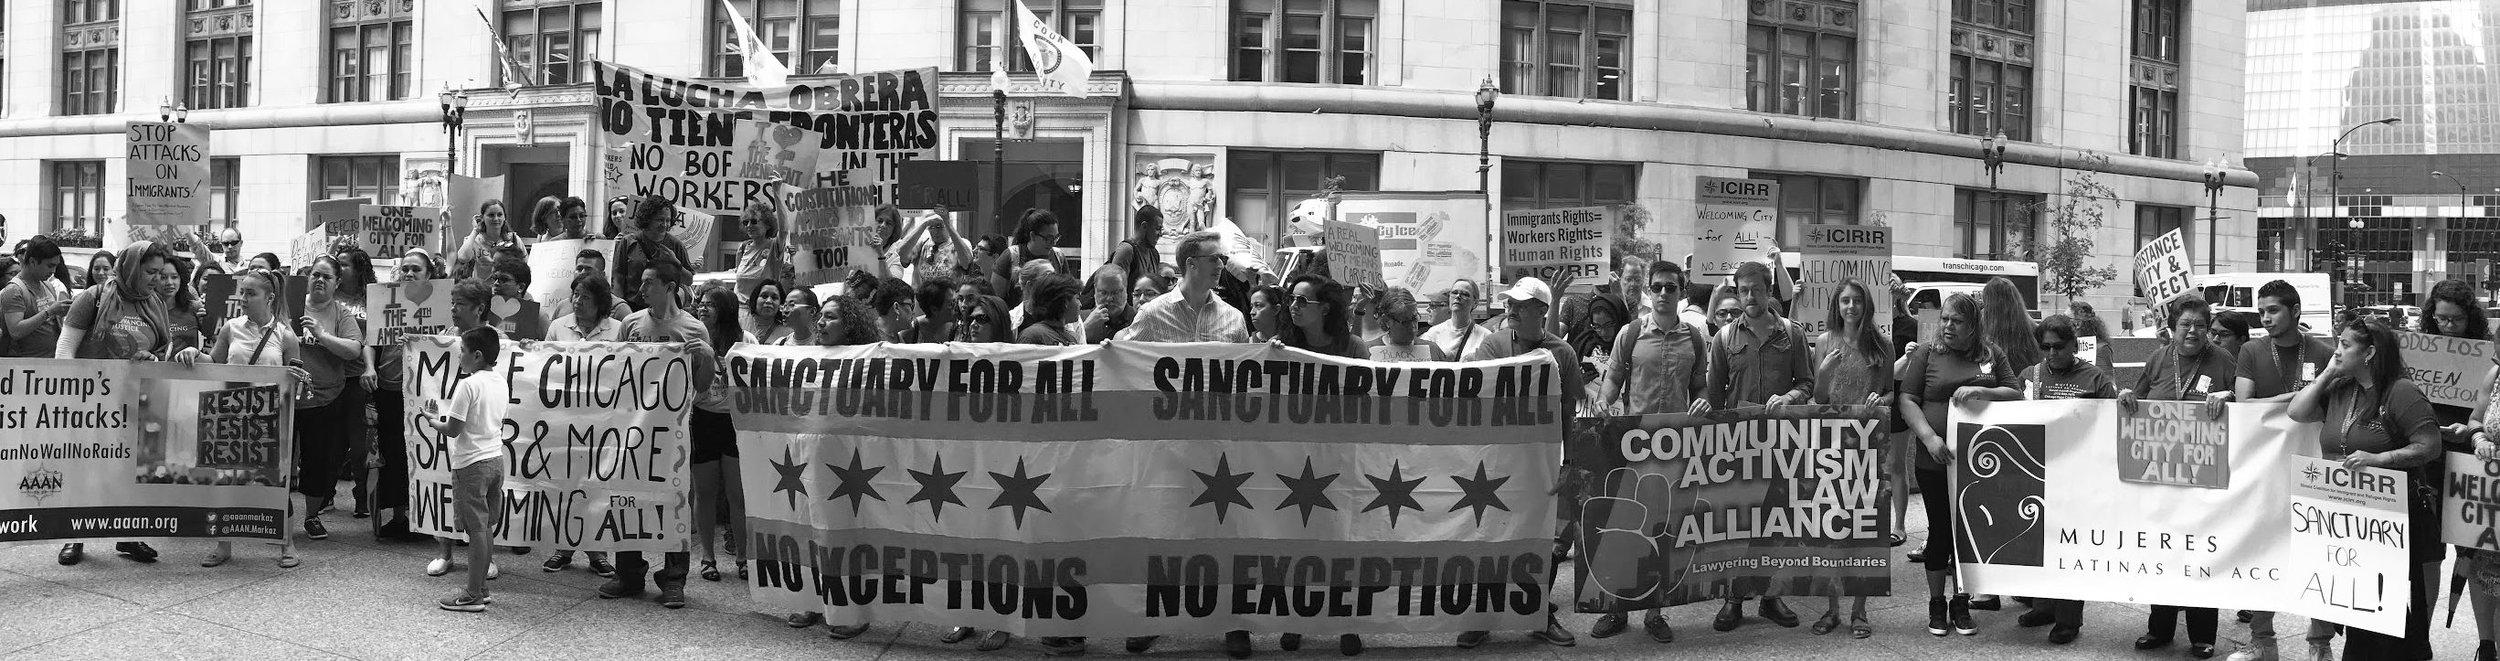 Activism Organizations Uniting Community Empowerment